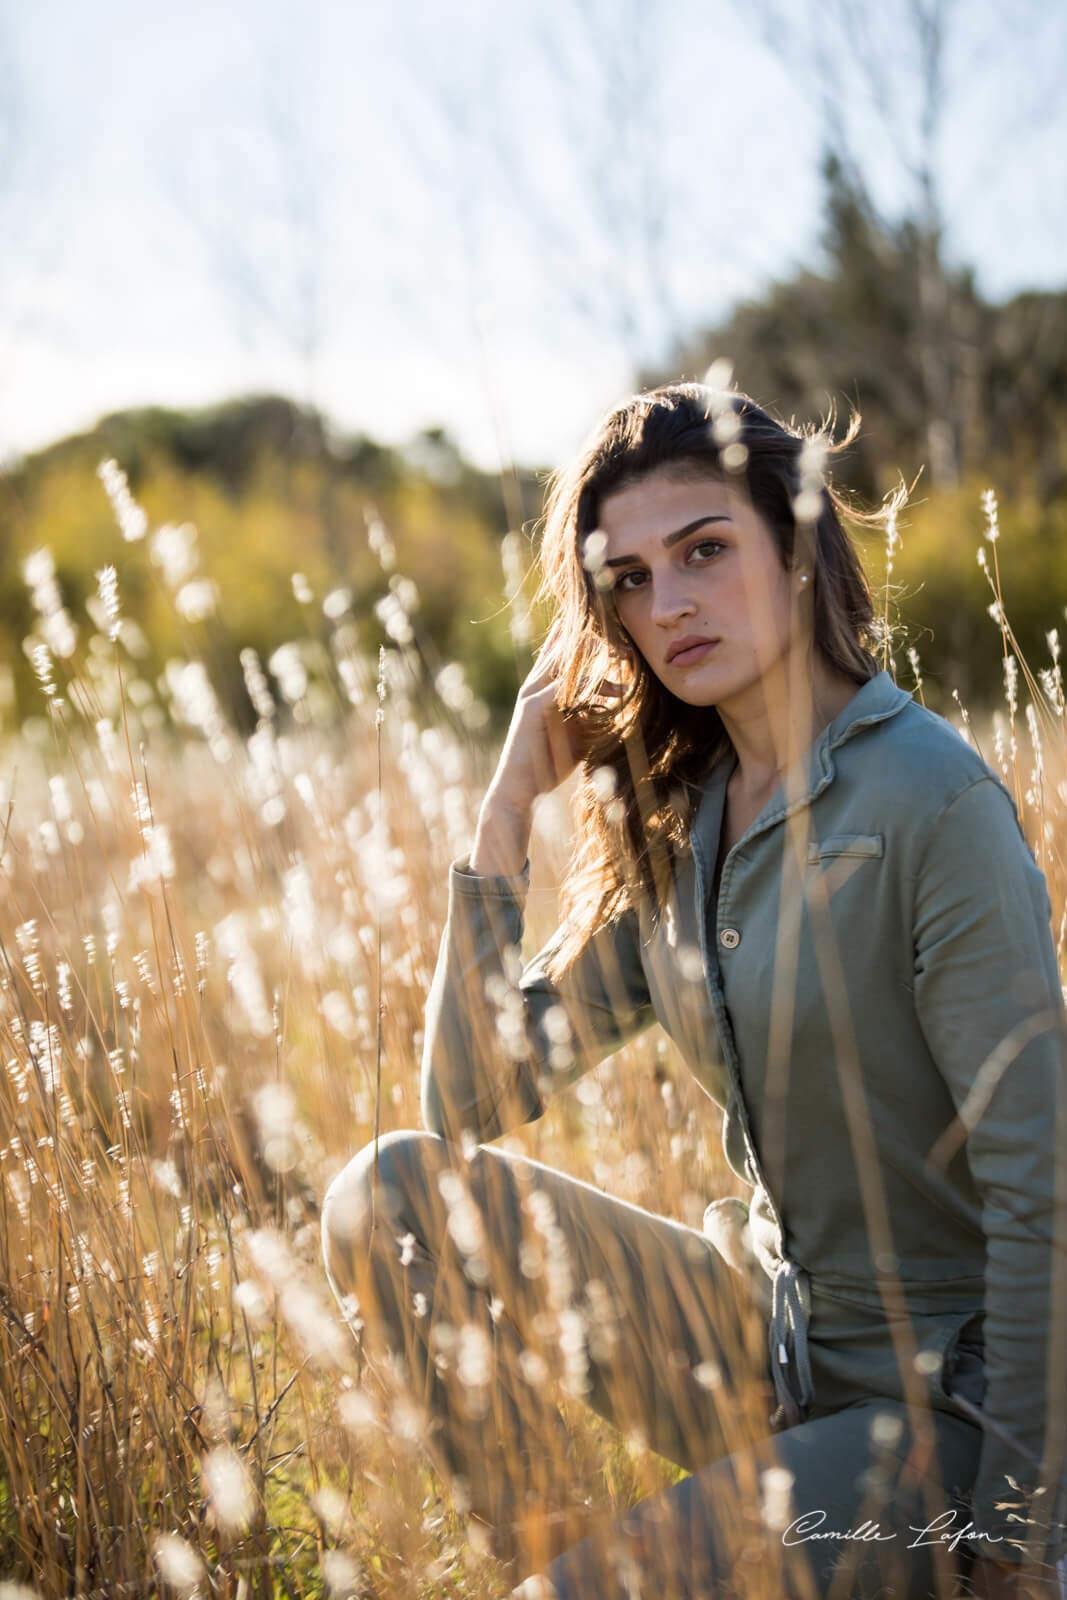 photographe montpellier casting lifestyle instagrameur modele